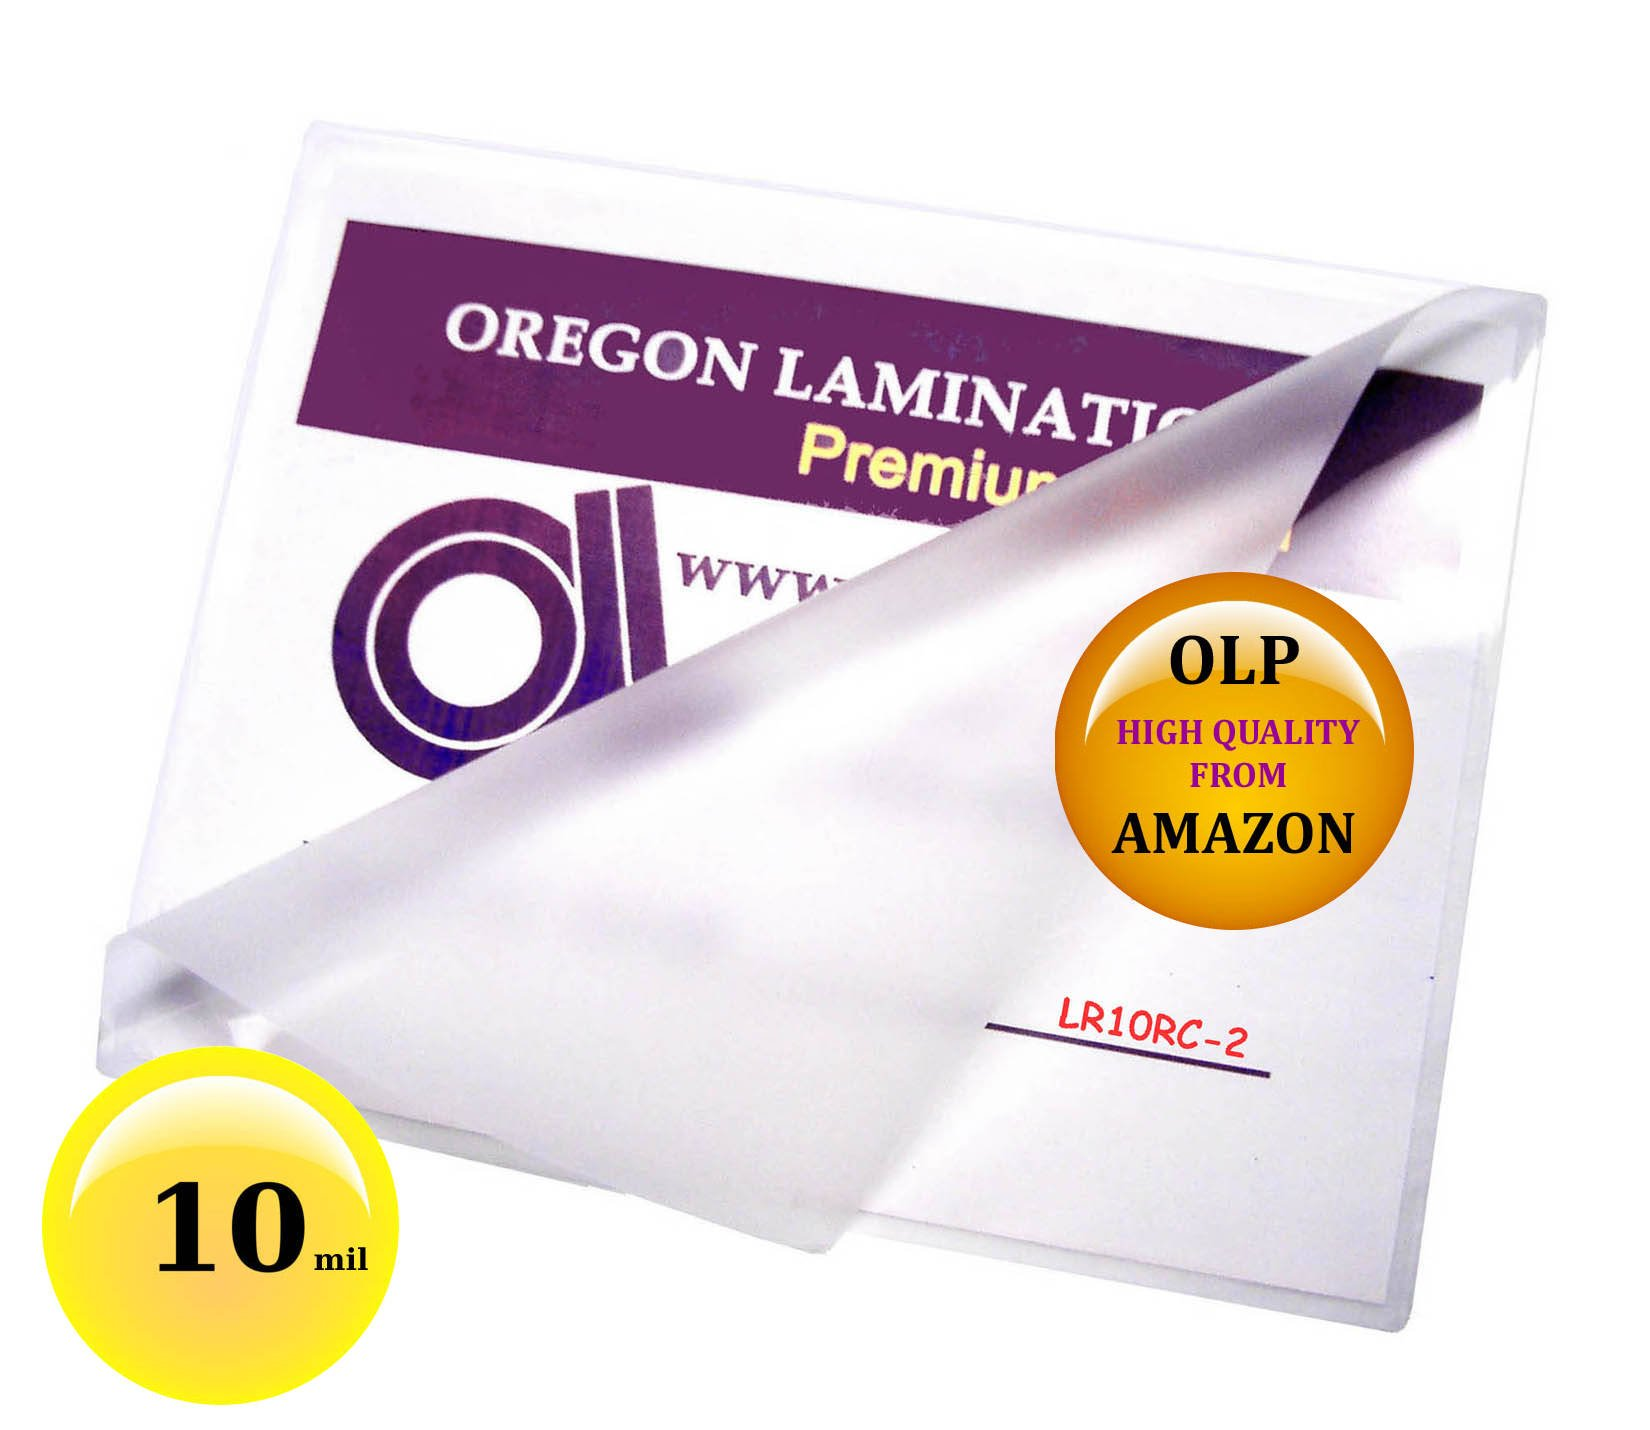 10 mil Letter Laminating Pouches 9 x 11-1/2 Hot Qty 100 by Oregon Lamination Premium